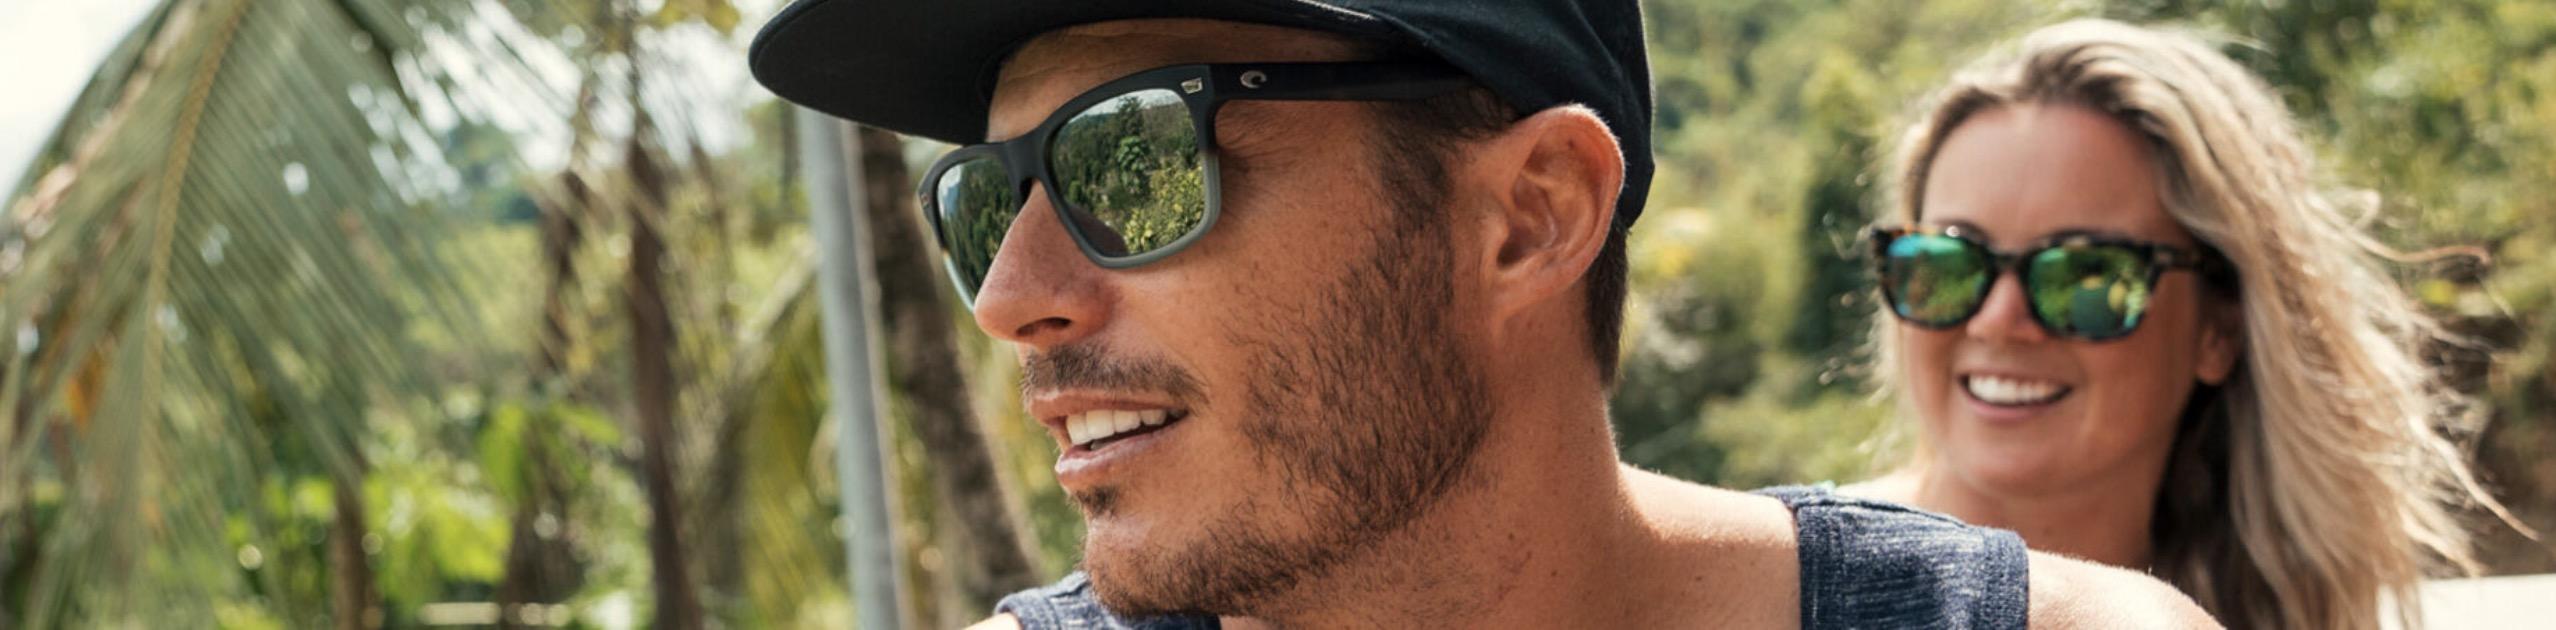 Costa Eyewear For Men and Women